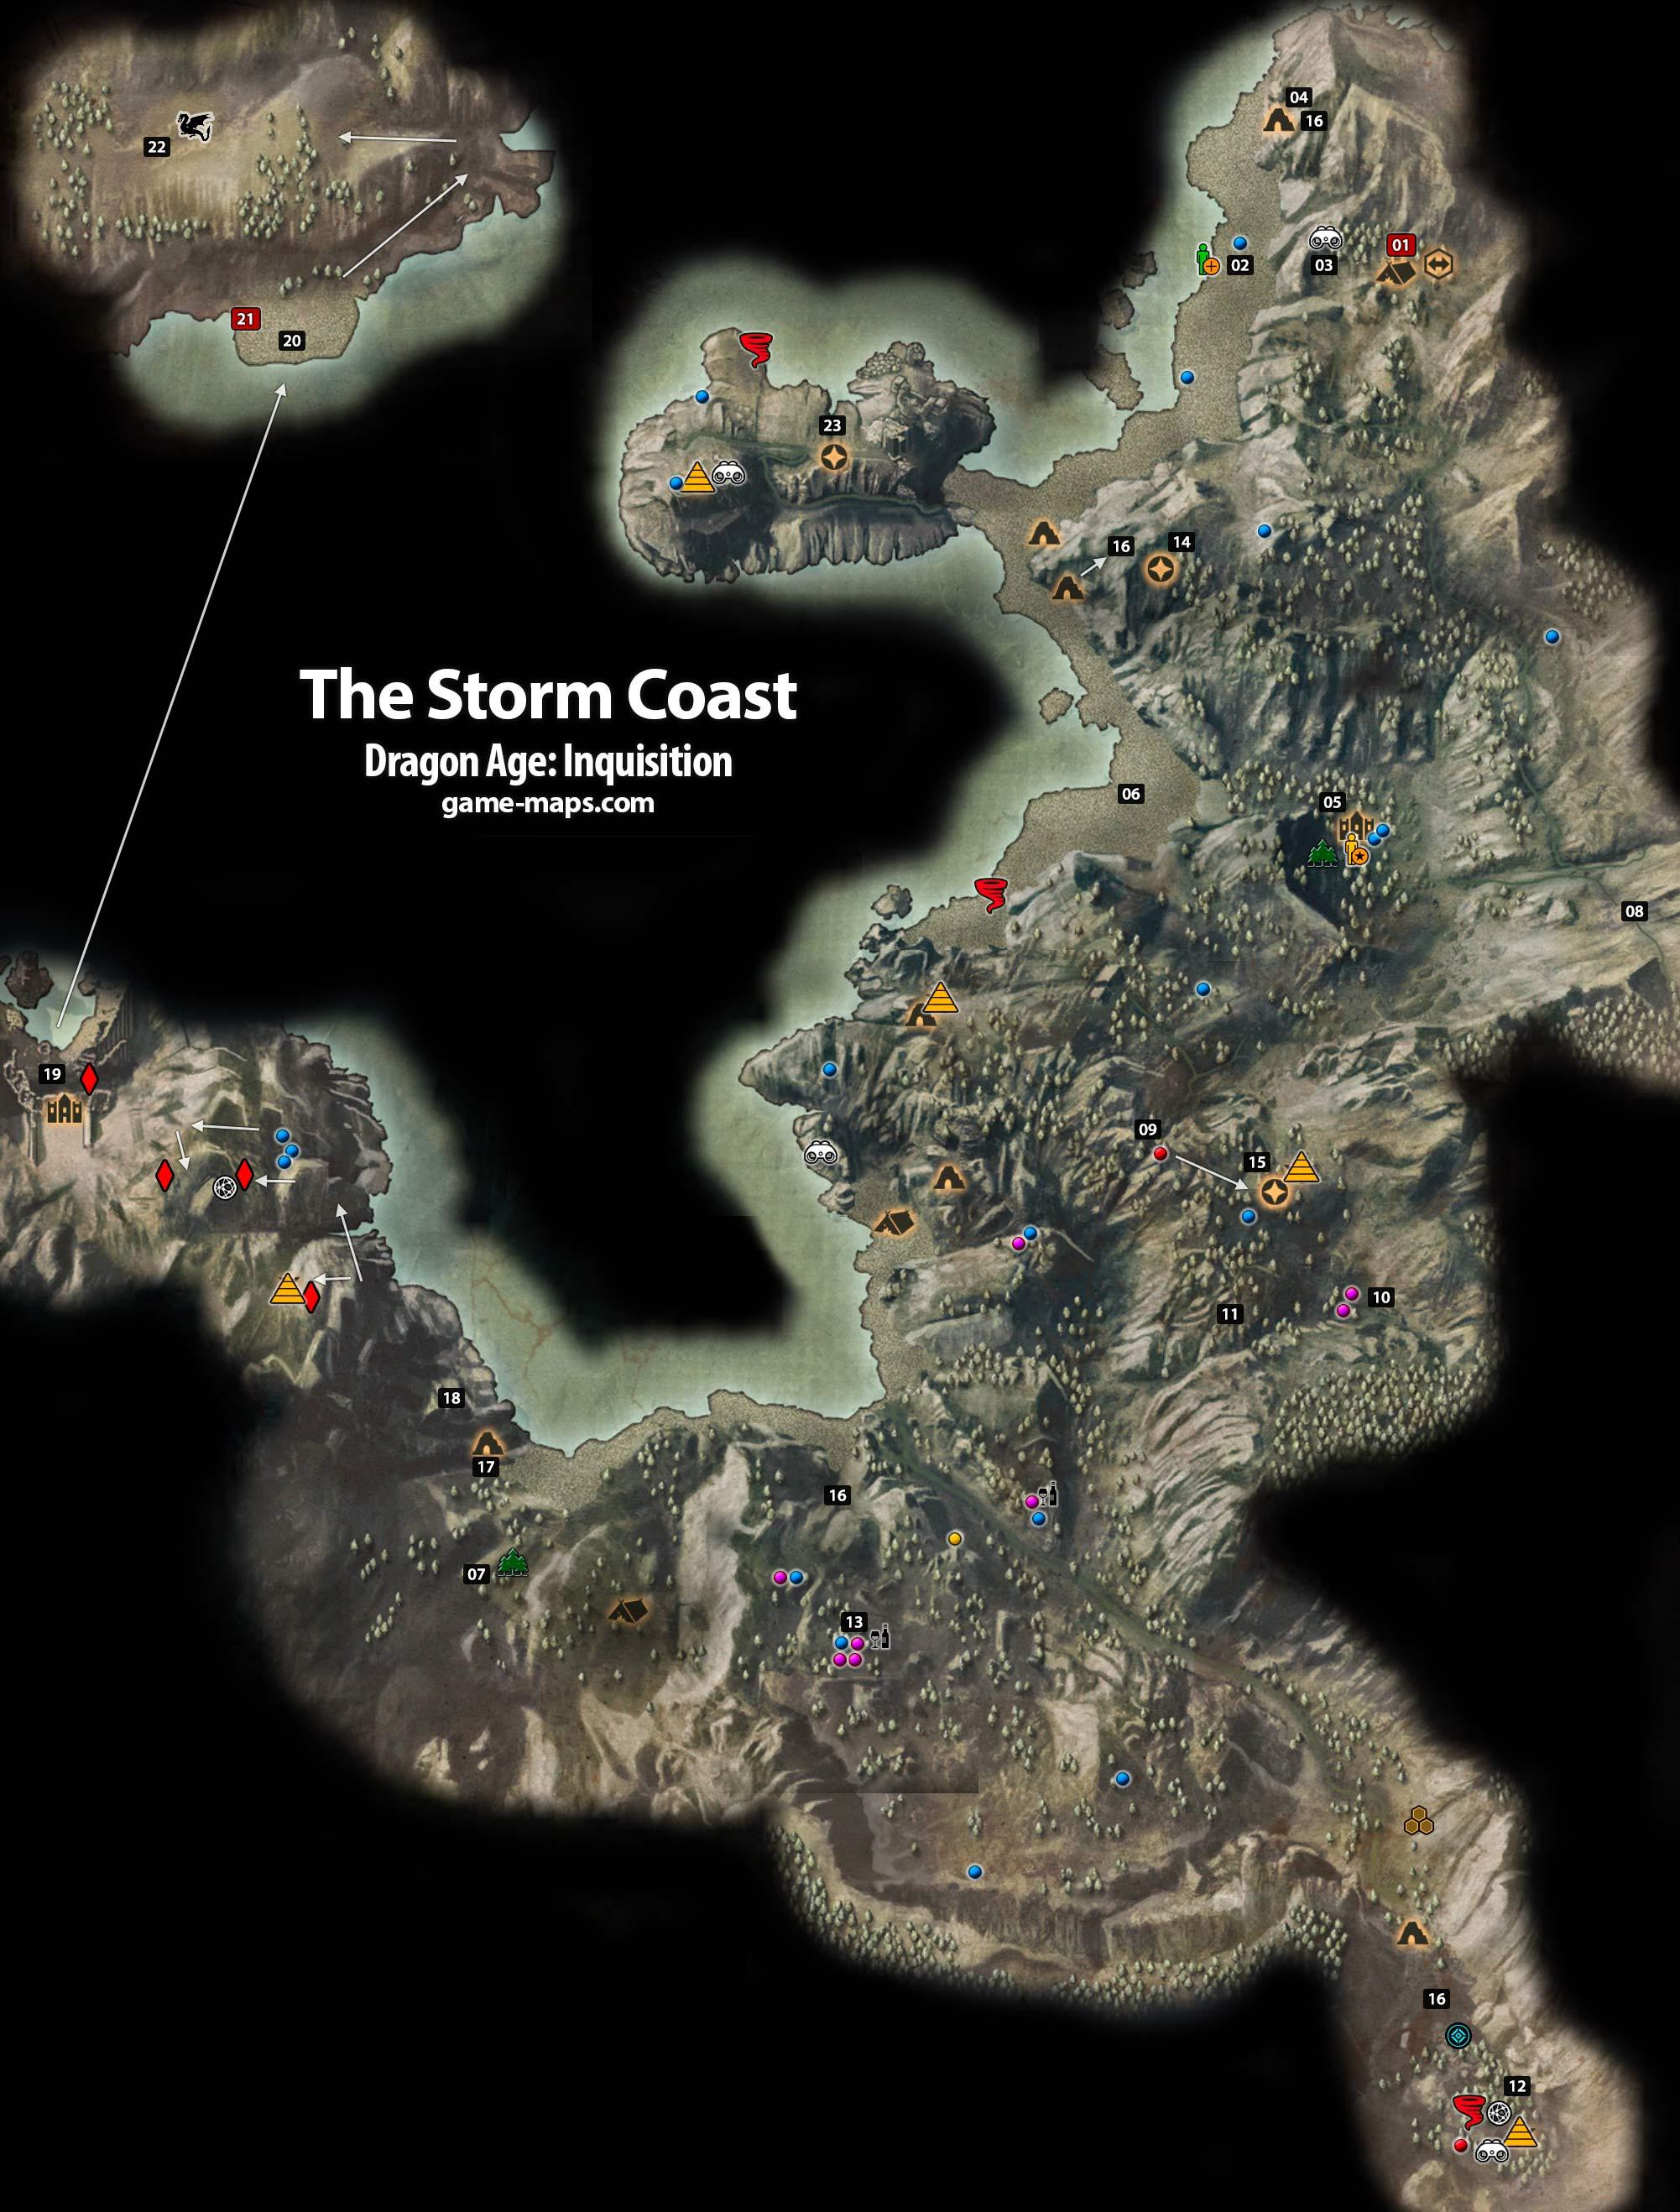 The Storm Coast - Dragon Age: Inquisition | game-maps.com on infamous second son map, infamous blast shards, infamous dead drops,